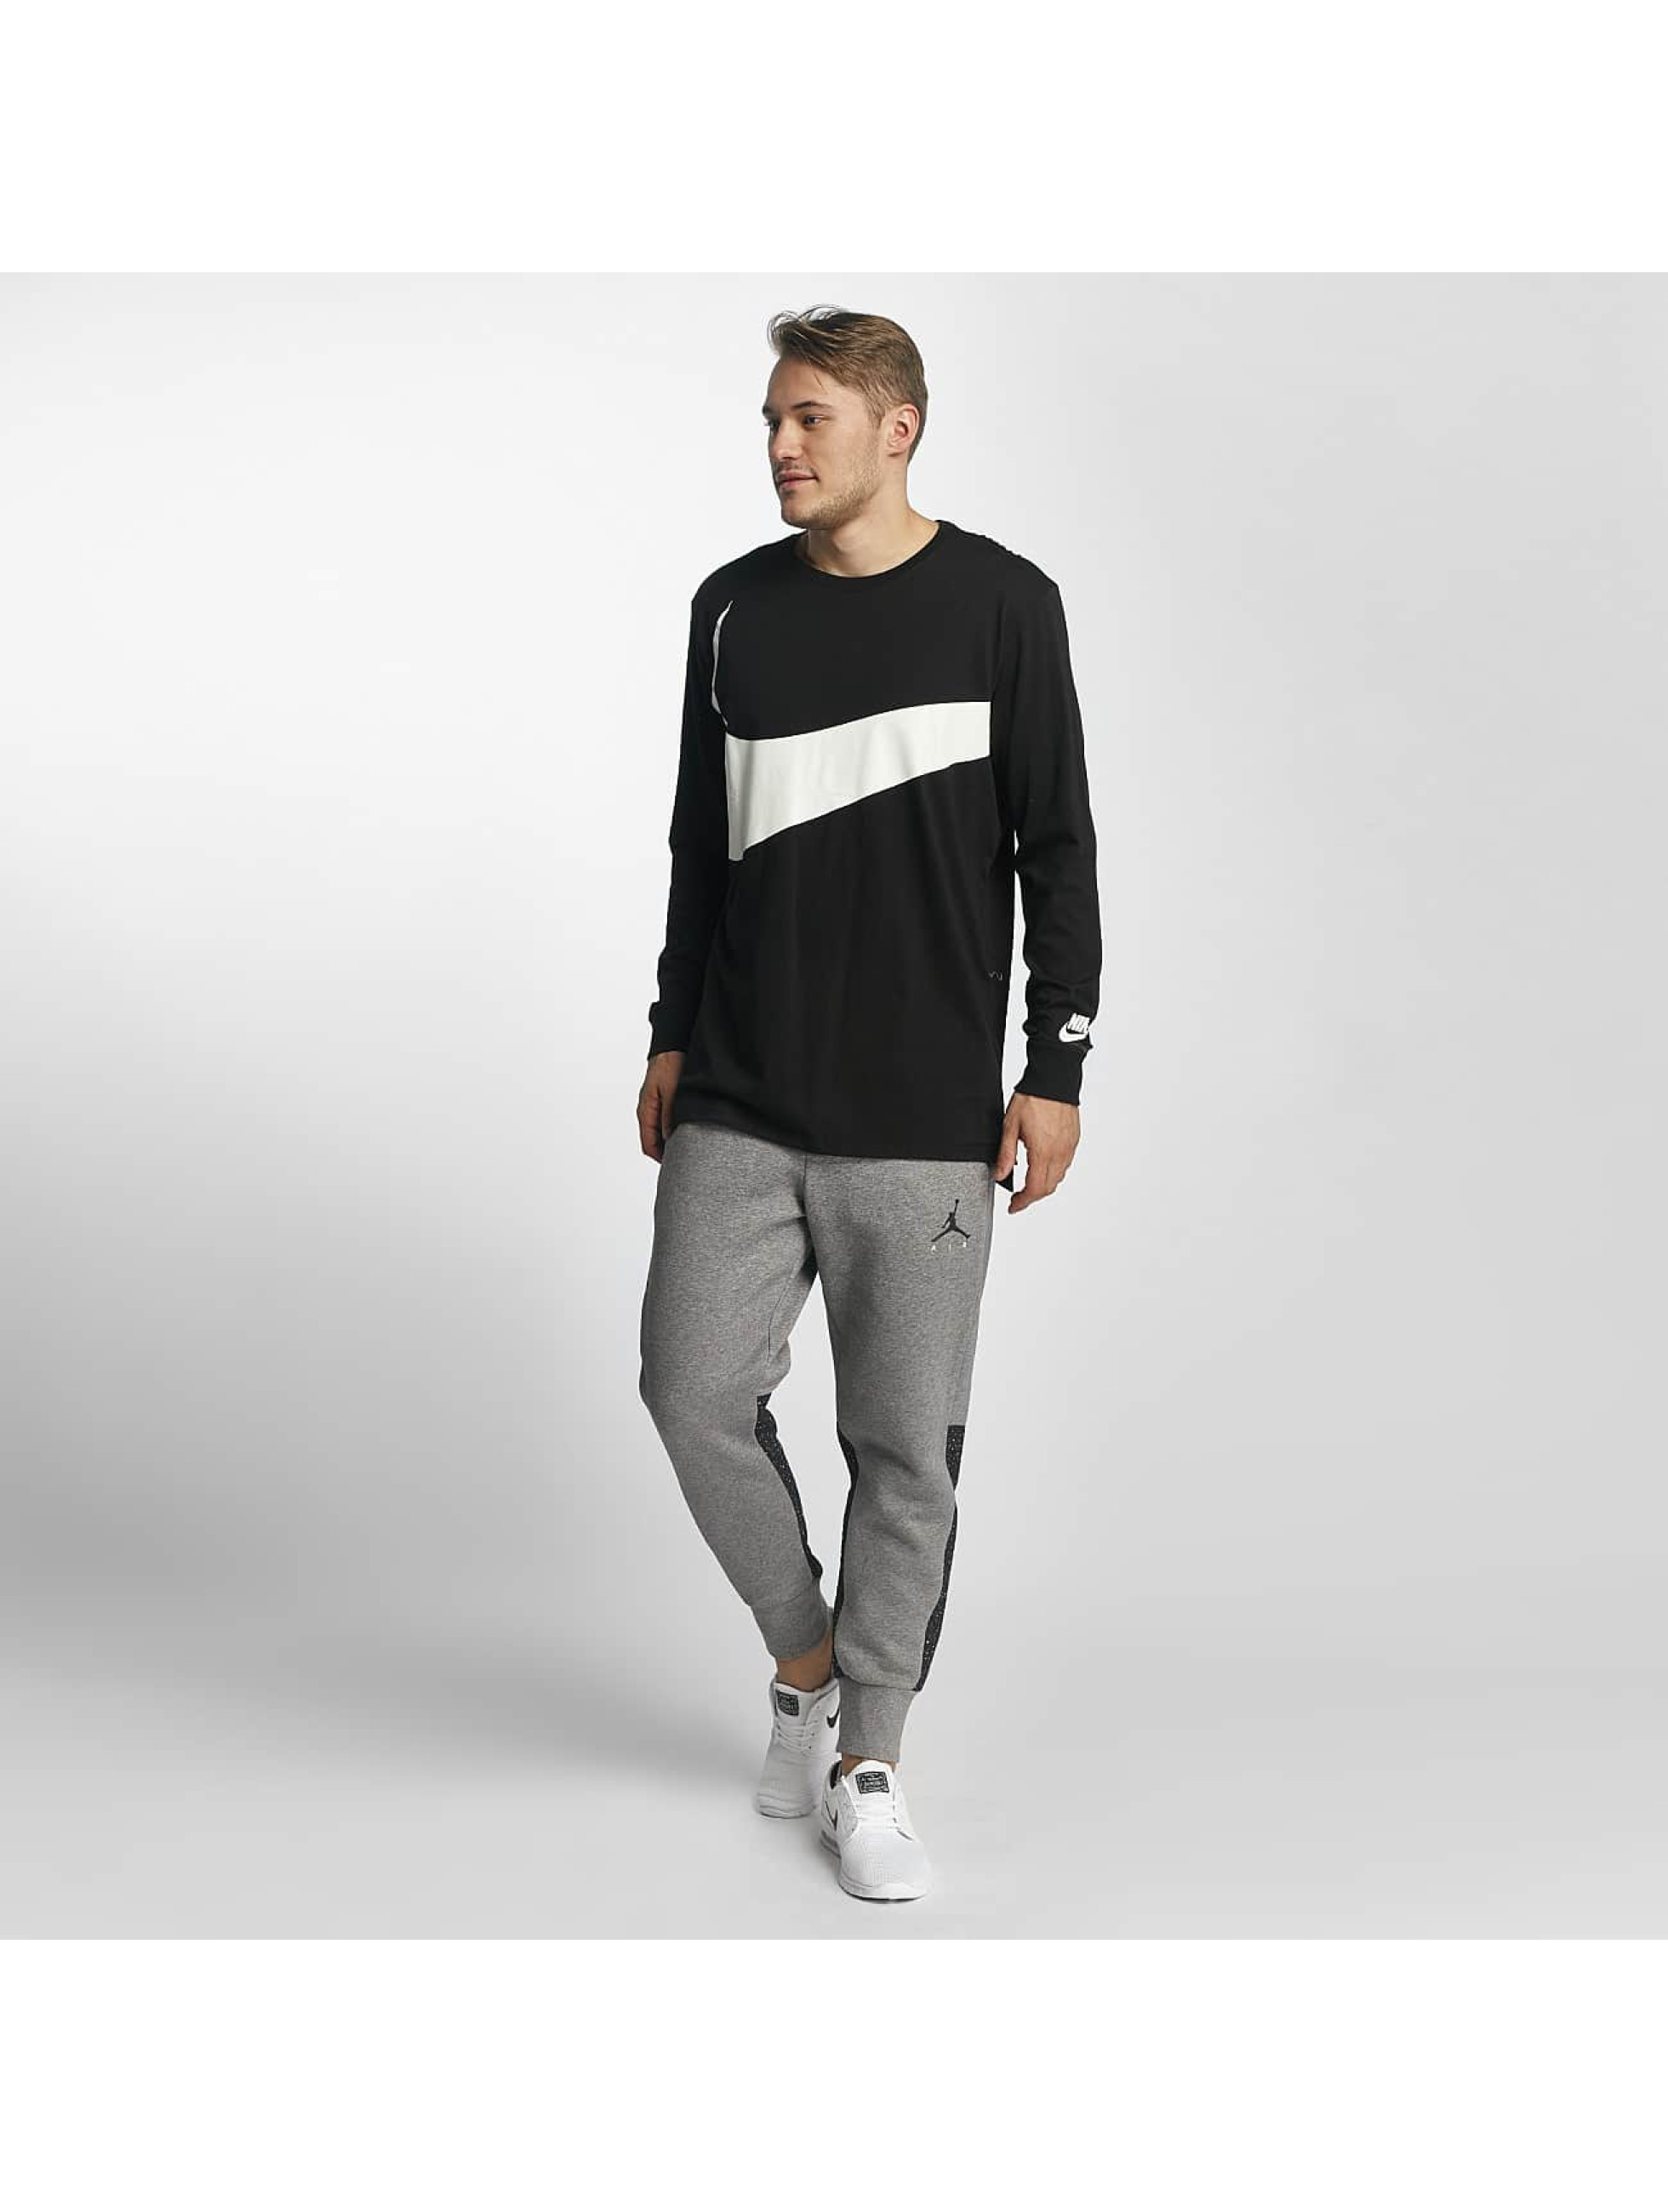 nike flight gris homme jogging nike acheter pas cher pantalon 363516. Black Bedroom Furniture Sets. Home Design Ideas